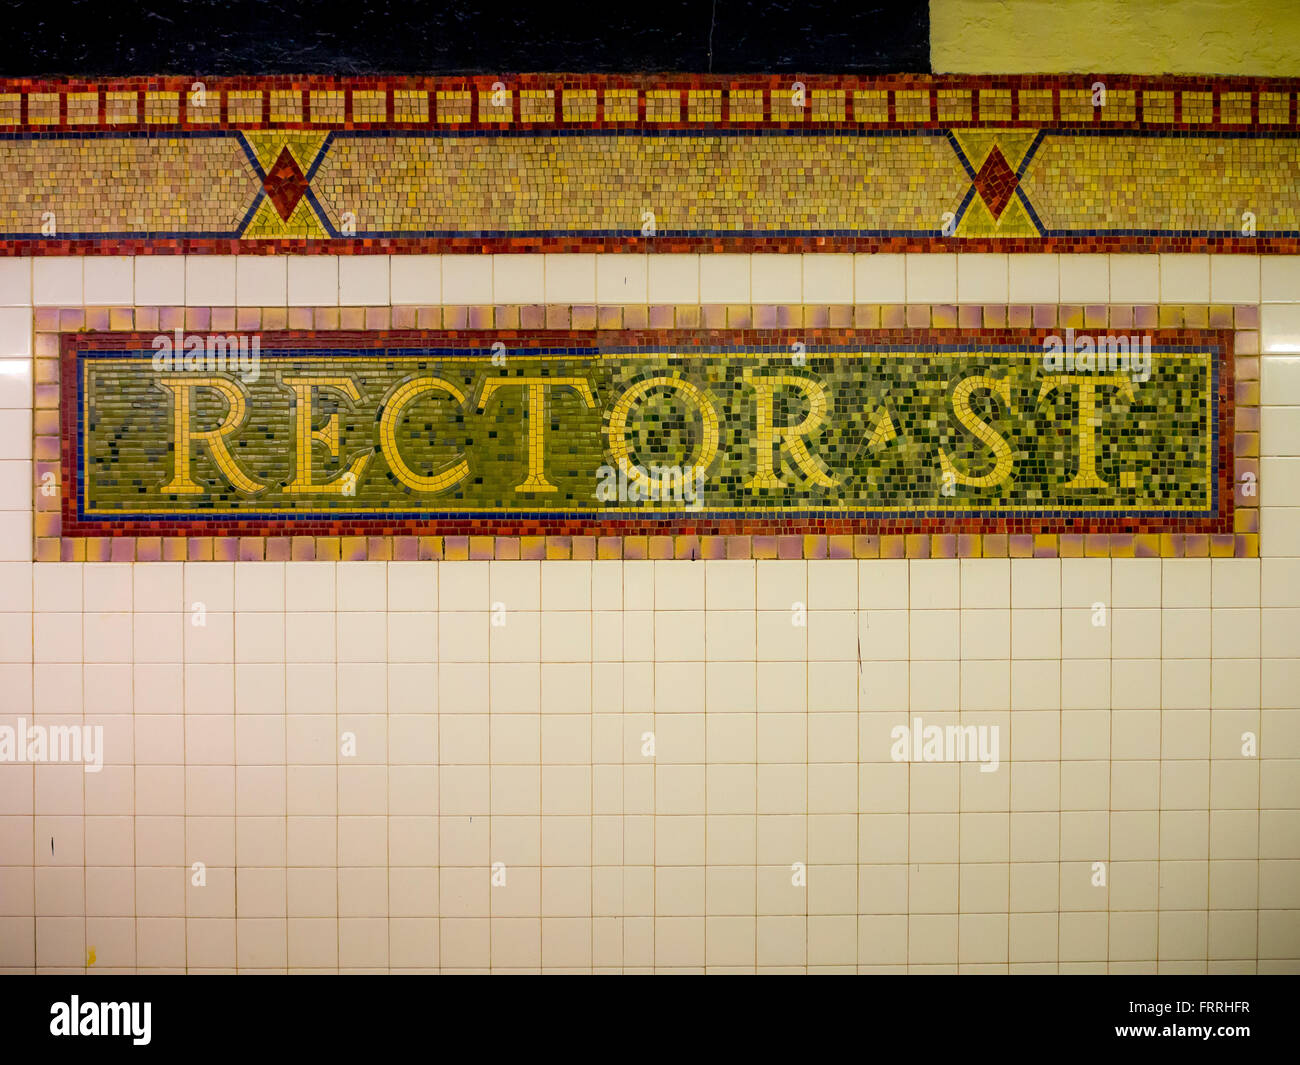 Rector St sign, Subway station, New York City, USA. - Stock Image